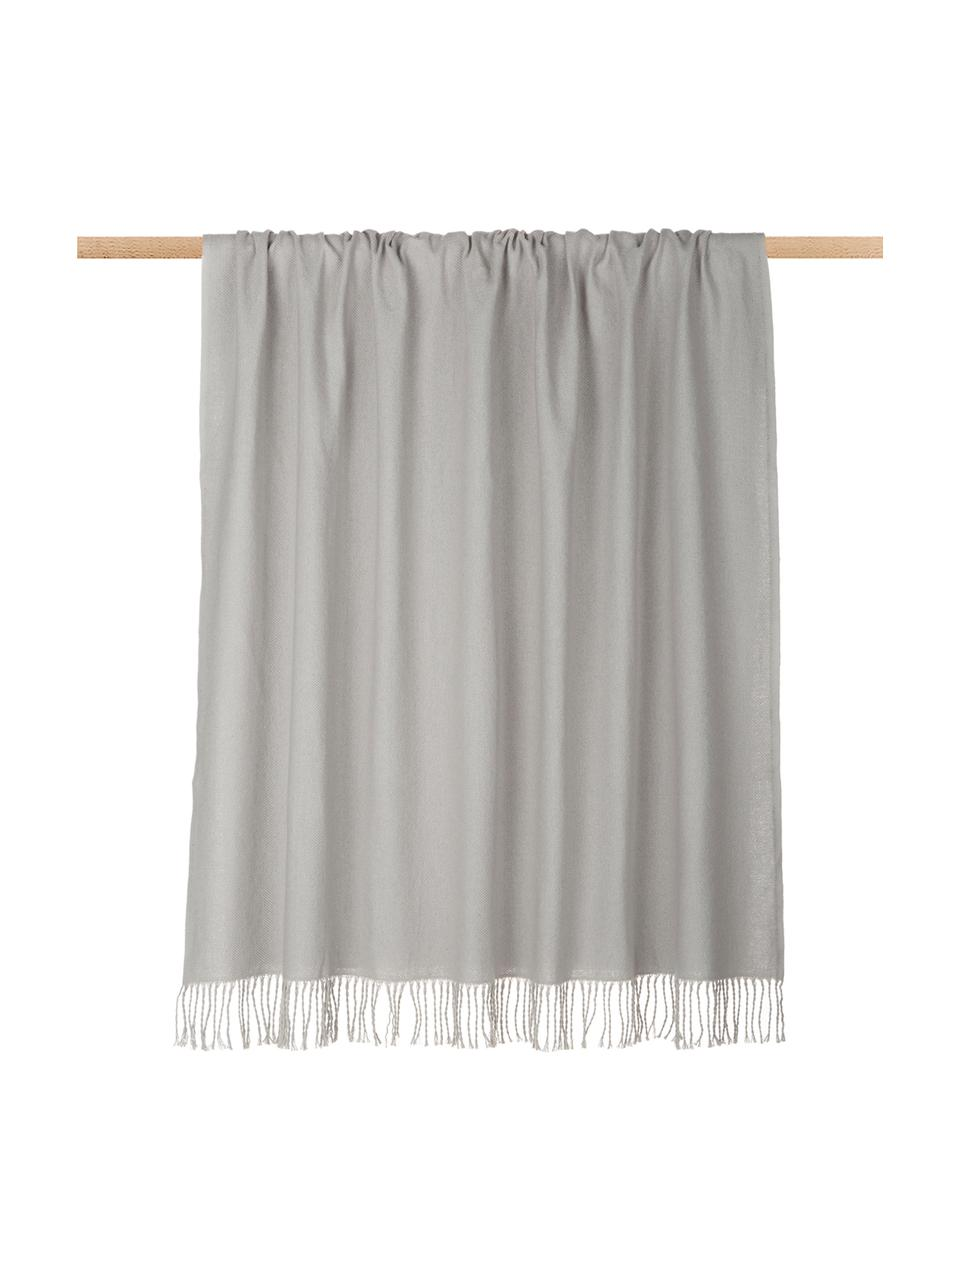 Plaid grigio chiaro con frange Madison, 100% cotone, Grigio chiaro, Larg. 140 x Lung. 170 cm